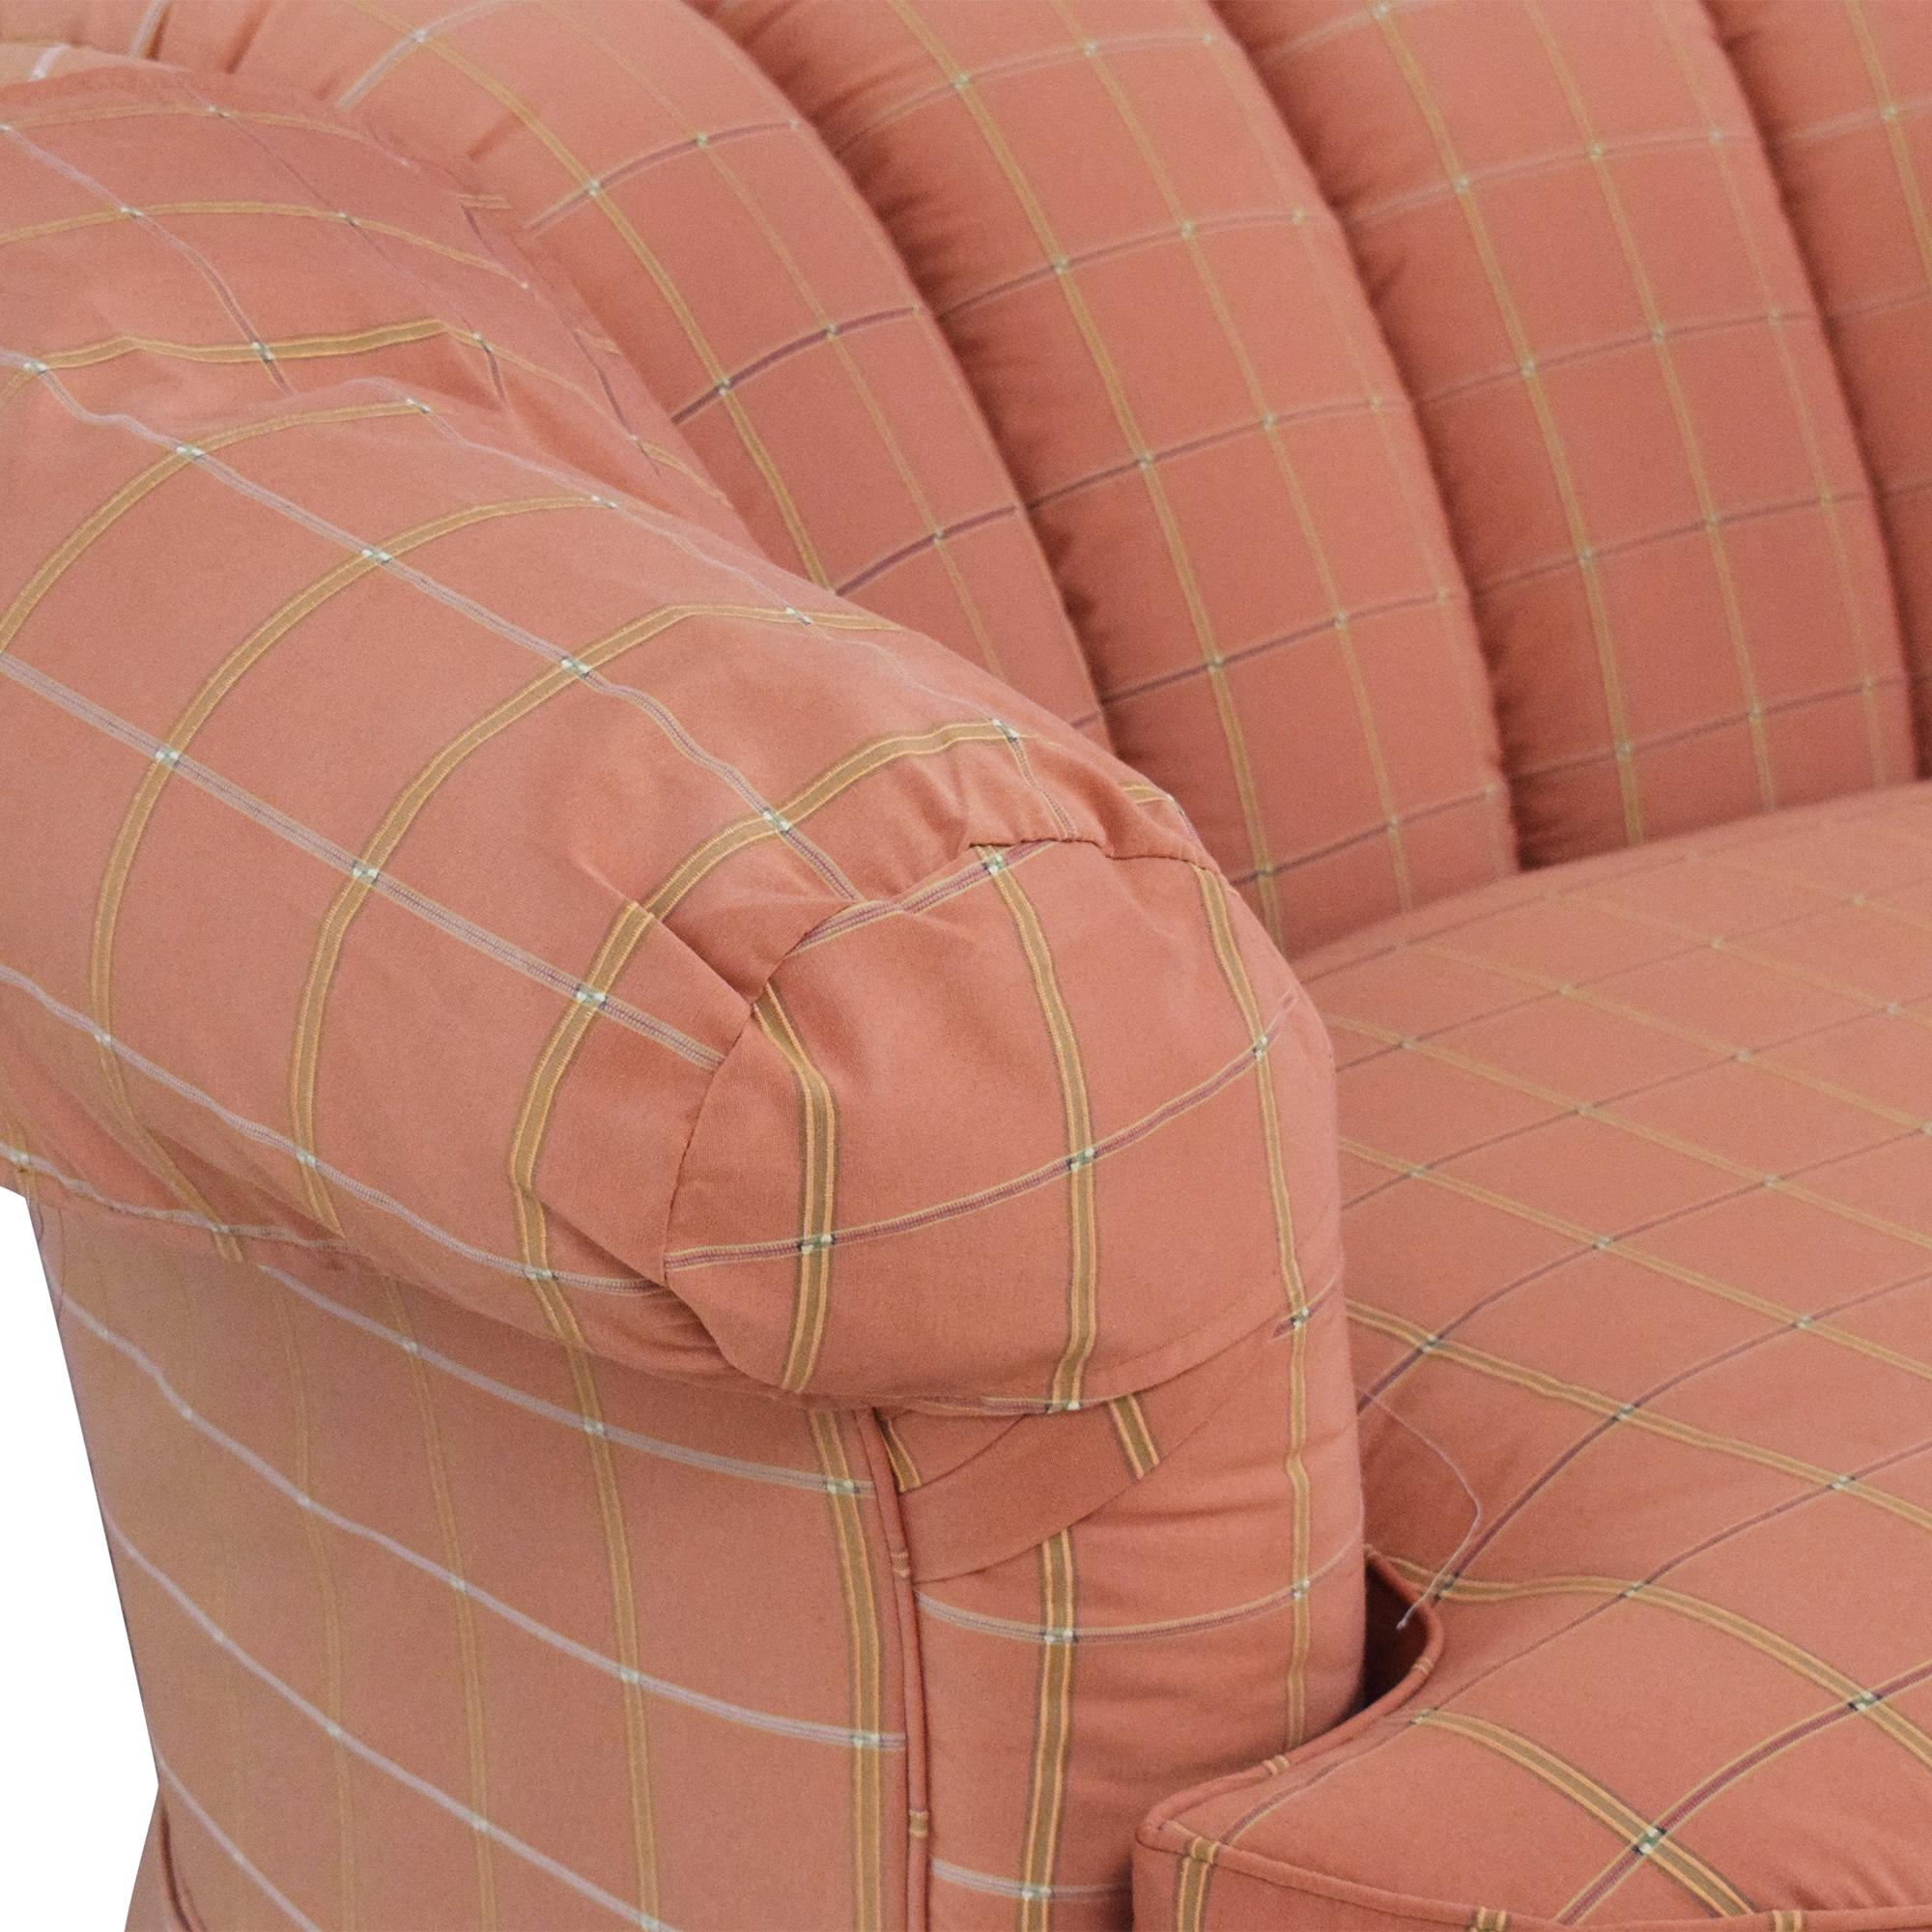 Highland House Furniture Highland House Scalloped Sofa on sale